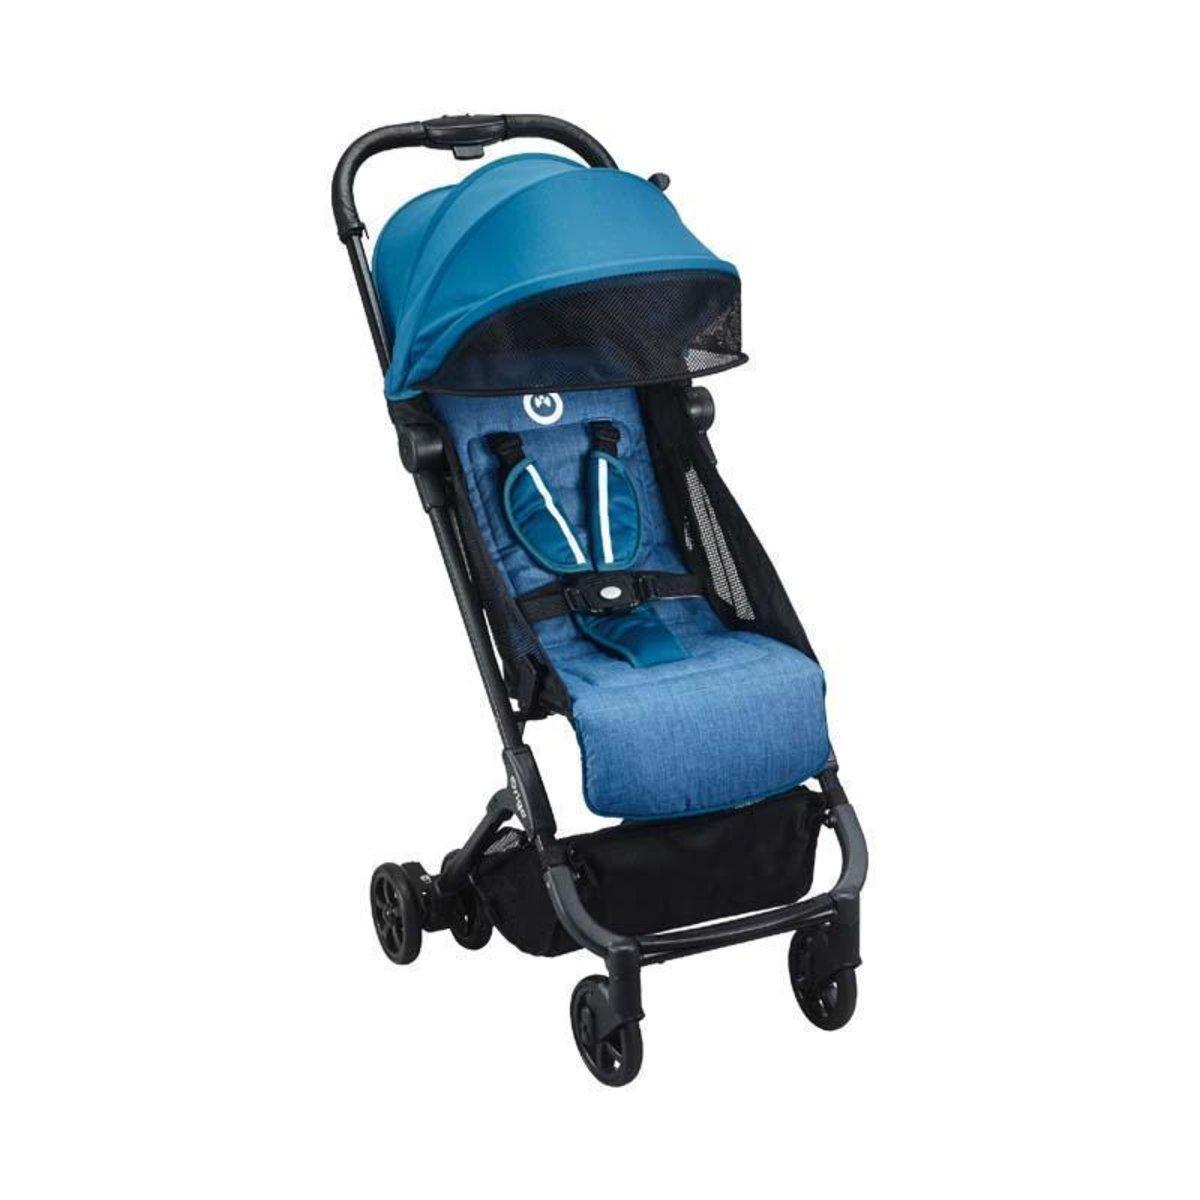 Bubble feather lightweight folding stroller 0-4 years British brands - Denim Blue